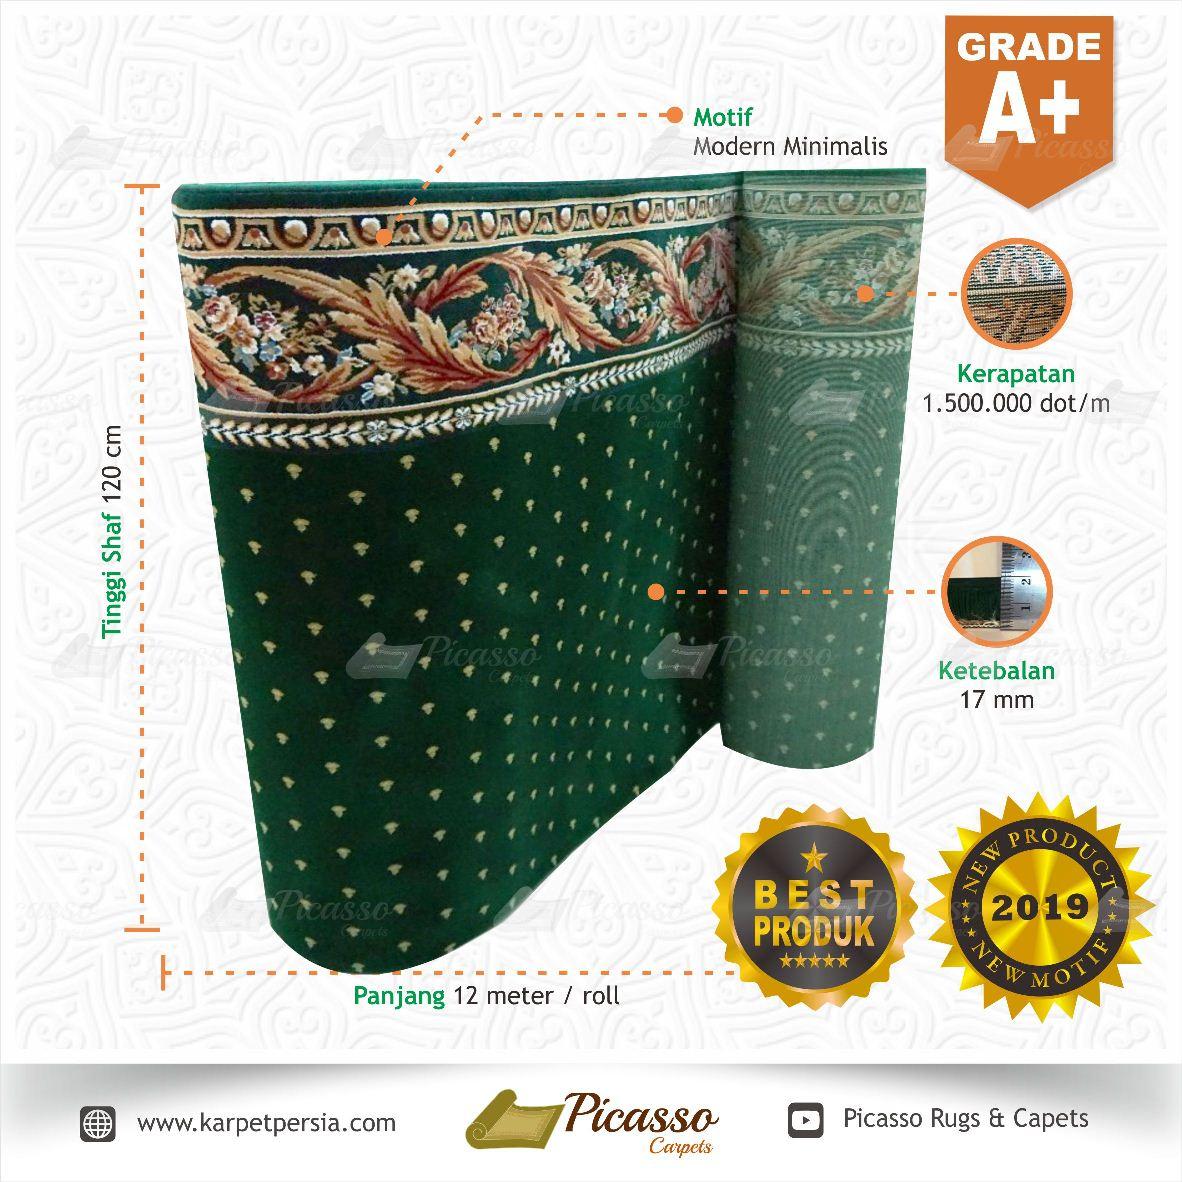 Karpet Masjid Grade A+